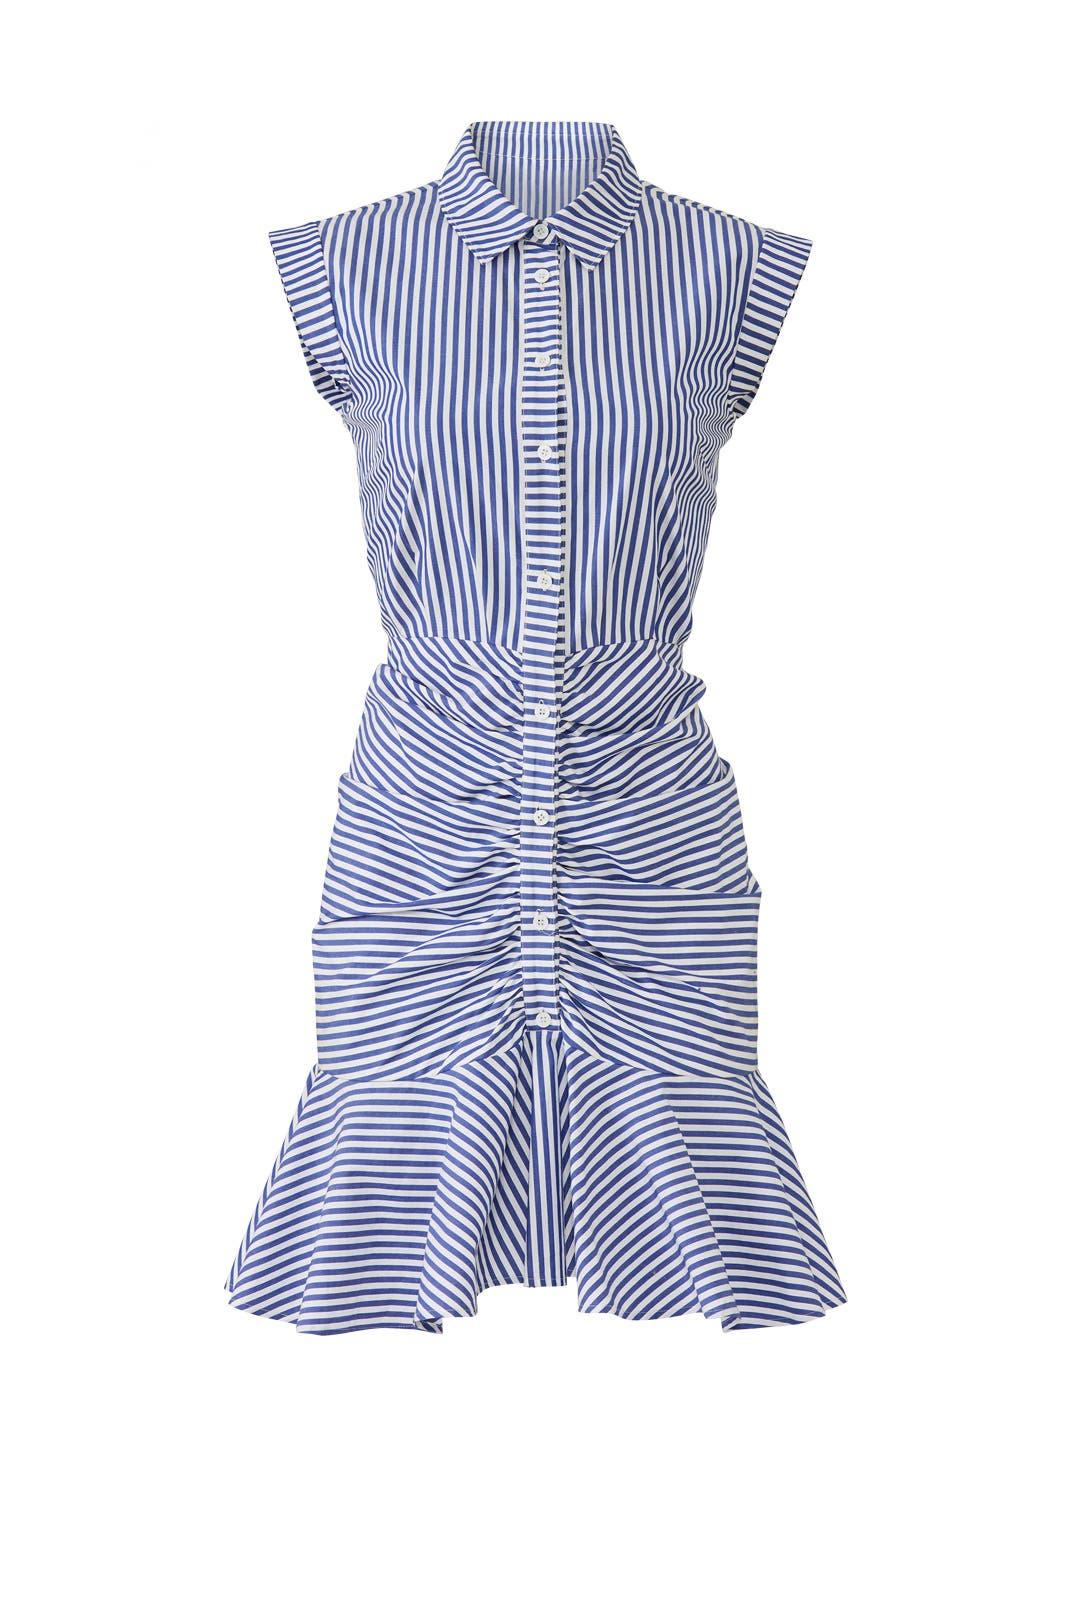 1ddd0c411ed Veronica Beard. Read Reviews. Bell Button Down Ruched Shirtdress